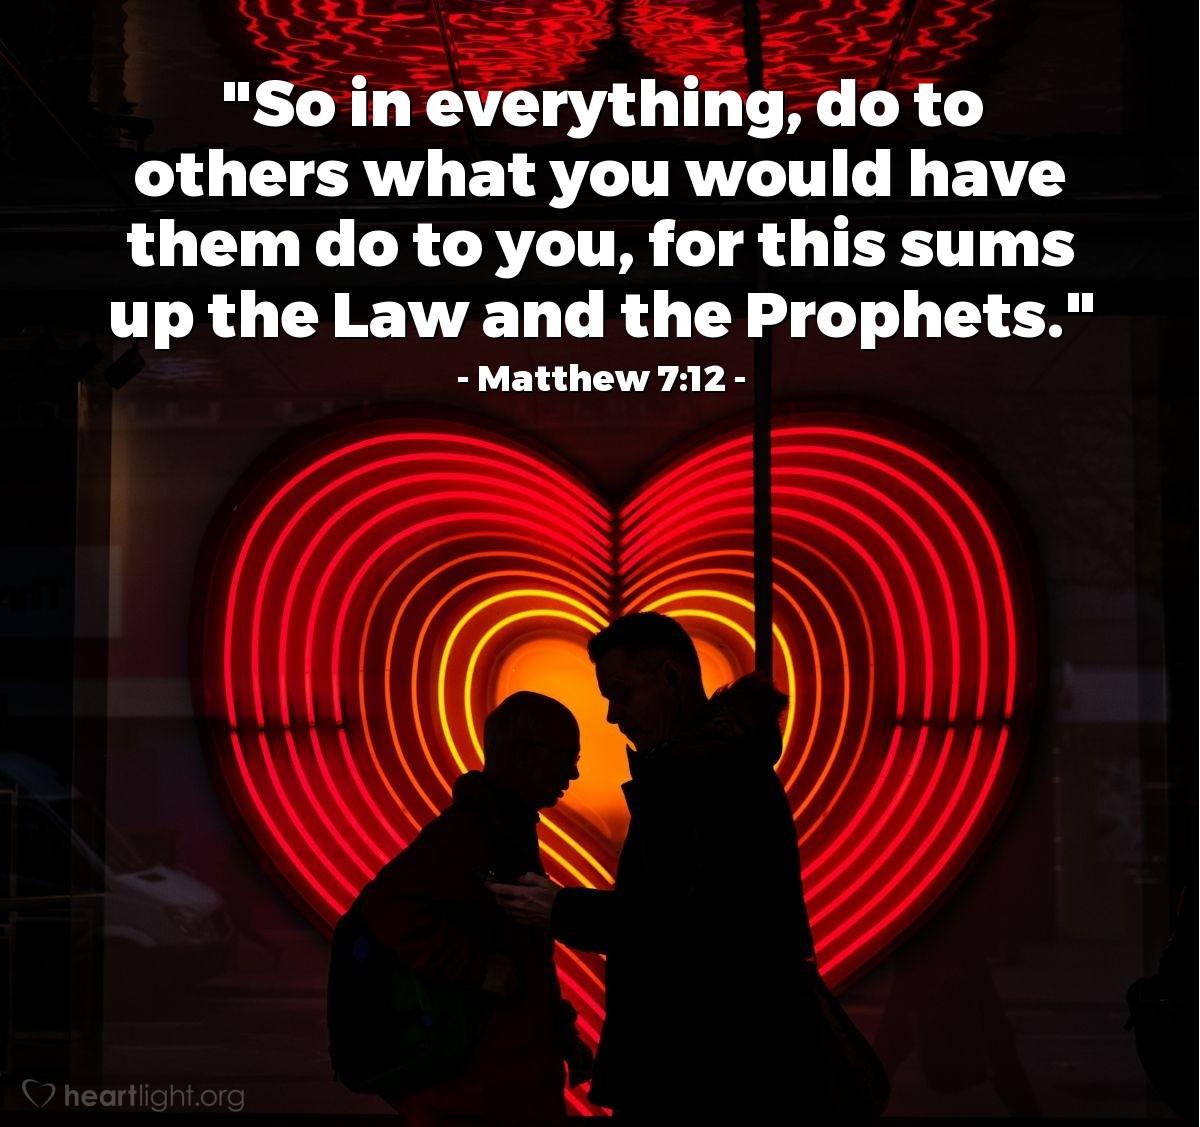 Inspirational illustration of Matthew 7:12